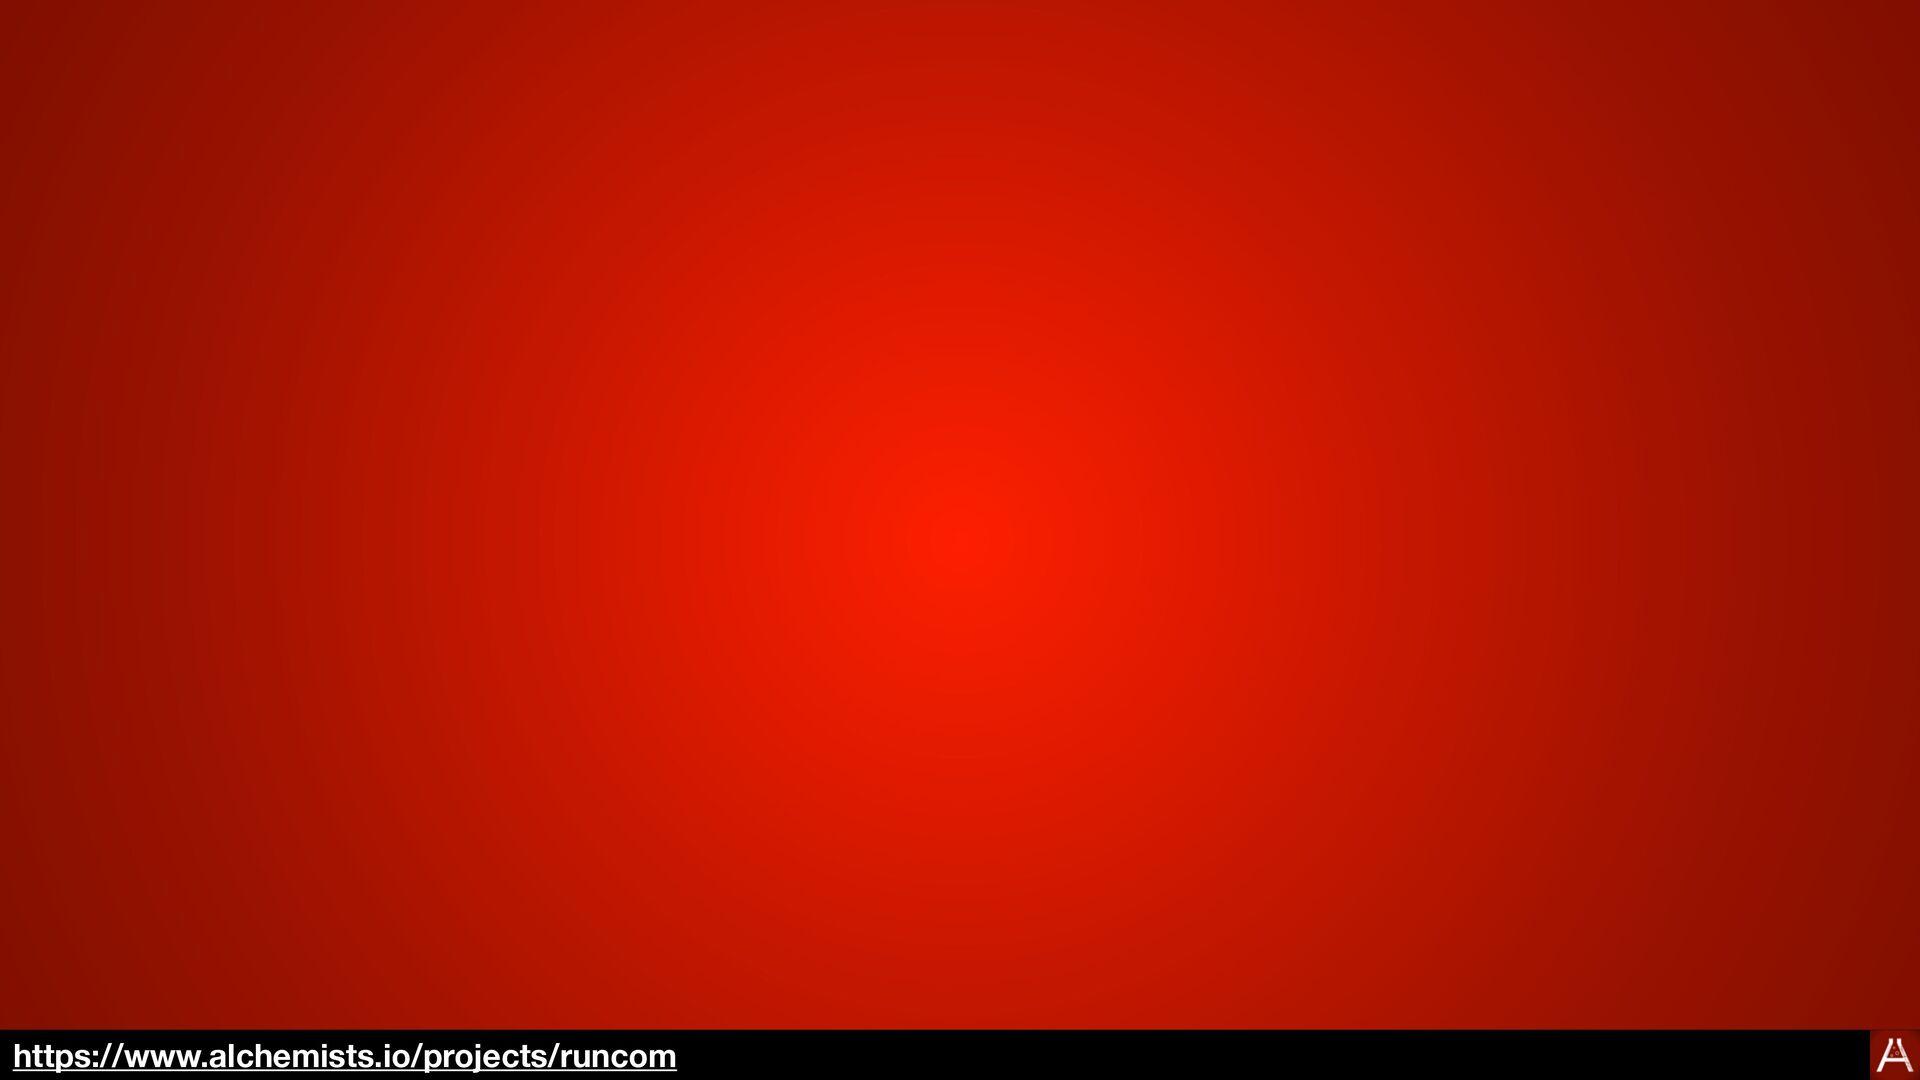 Runcom https://www.alchemists.io/projects/runcom